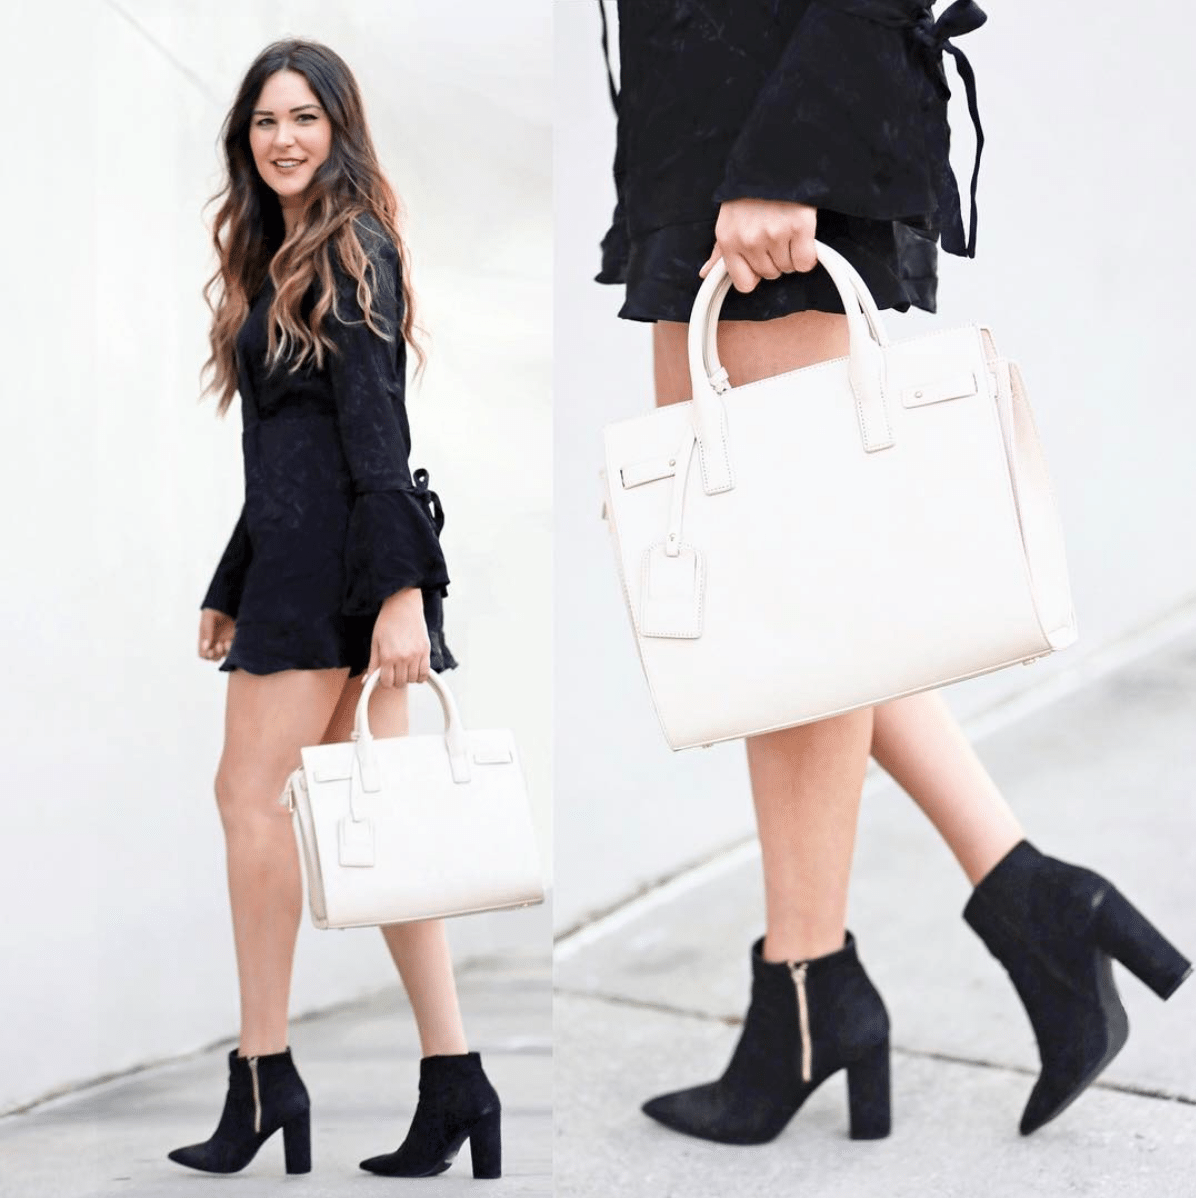 Shop my instagram | Mash Elle beauty blogger | fashion inspo | Shop my closet | instagram style | black bell sleeved romper